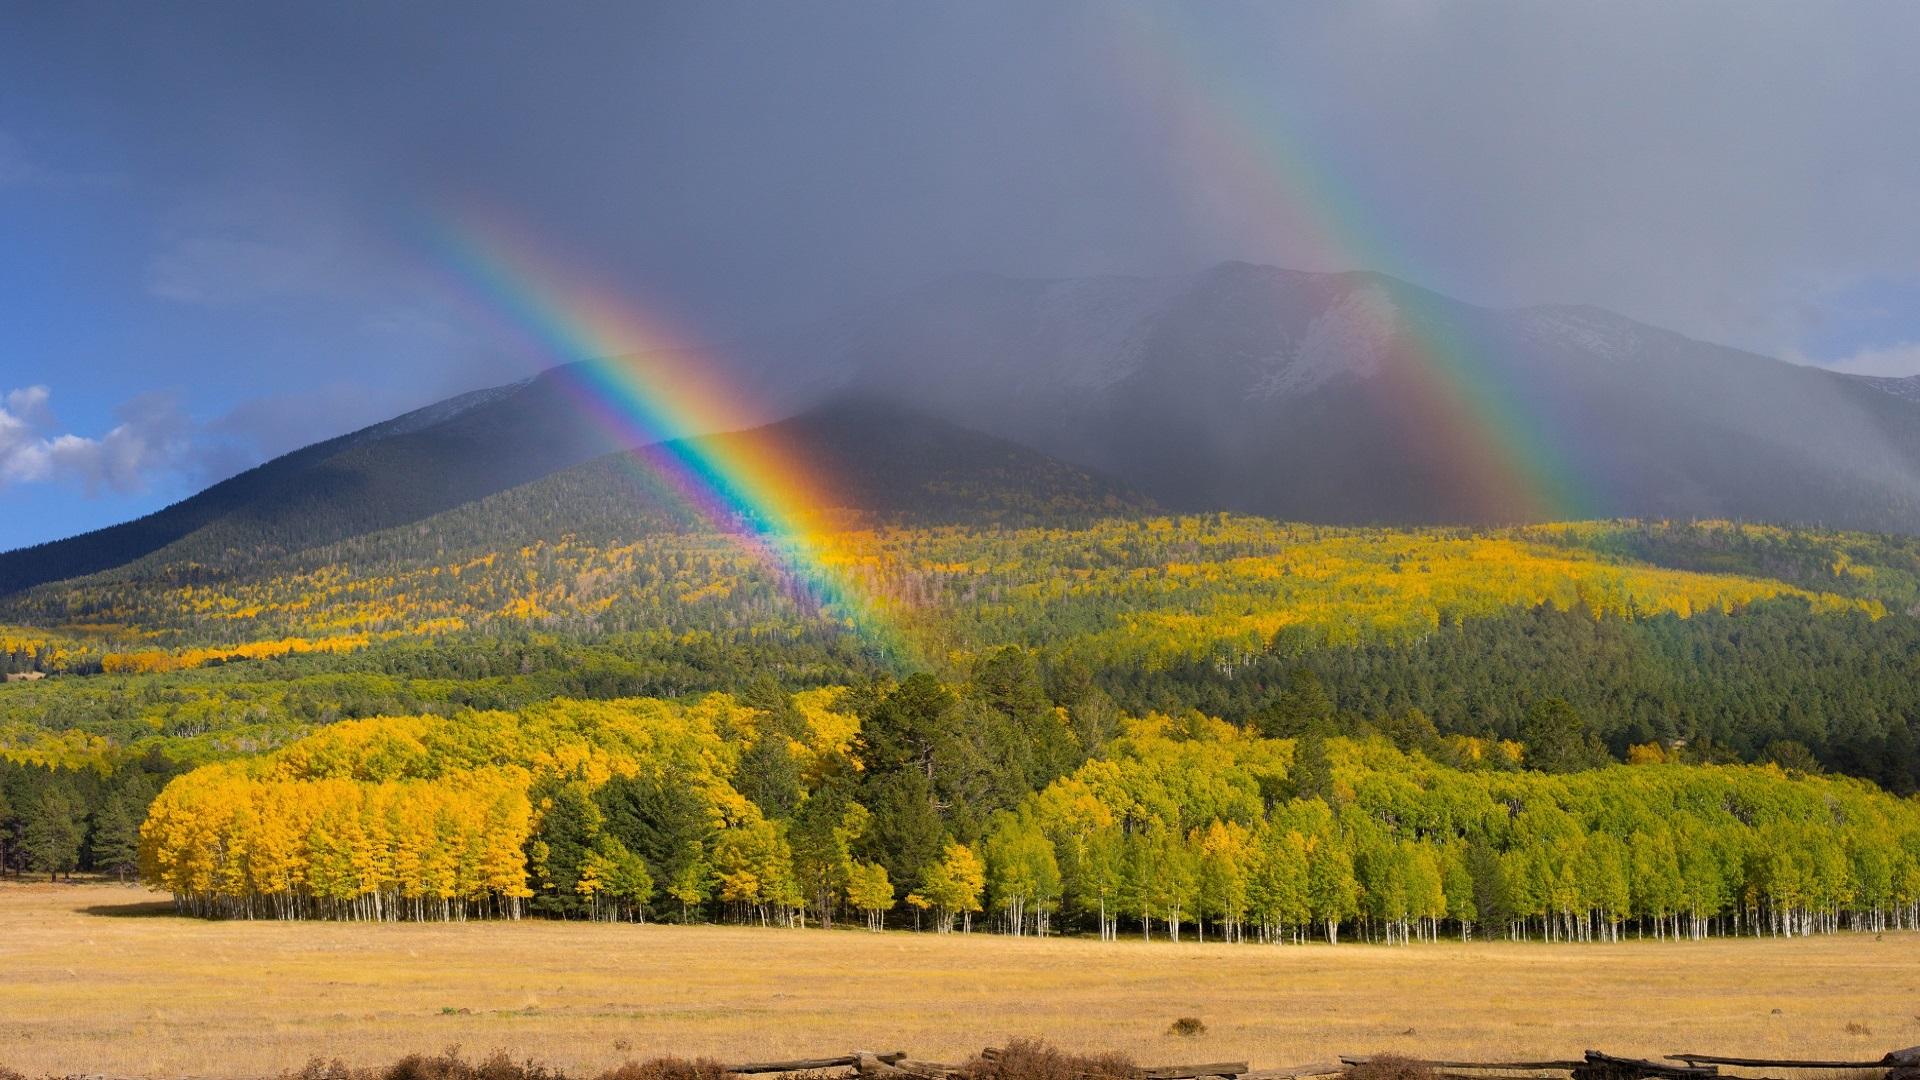 real rainbow wallpaper - photo #21